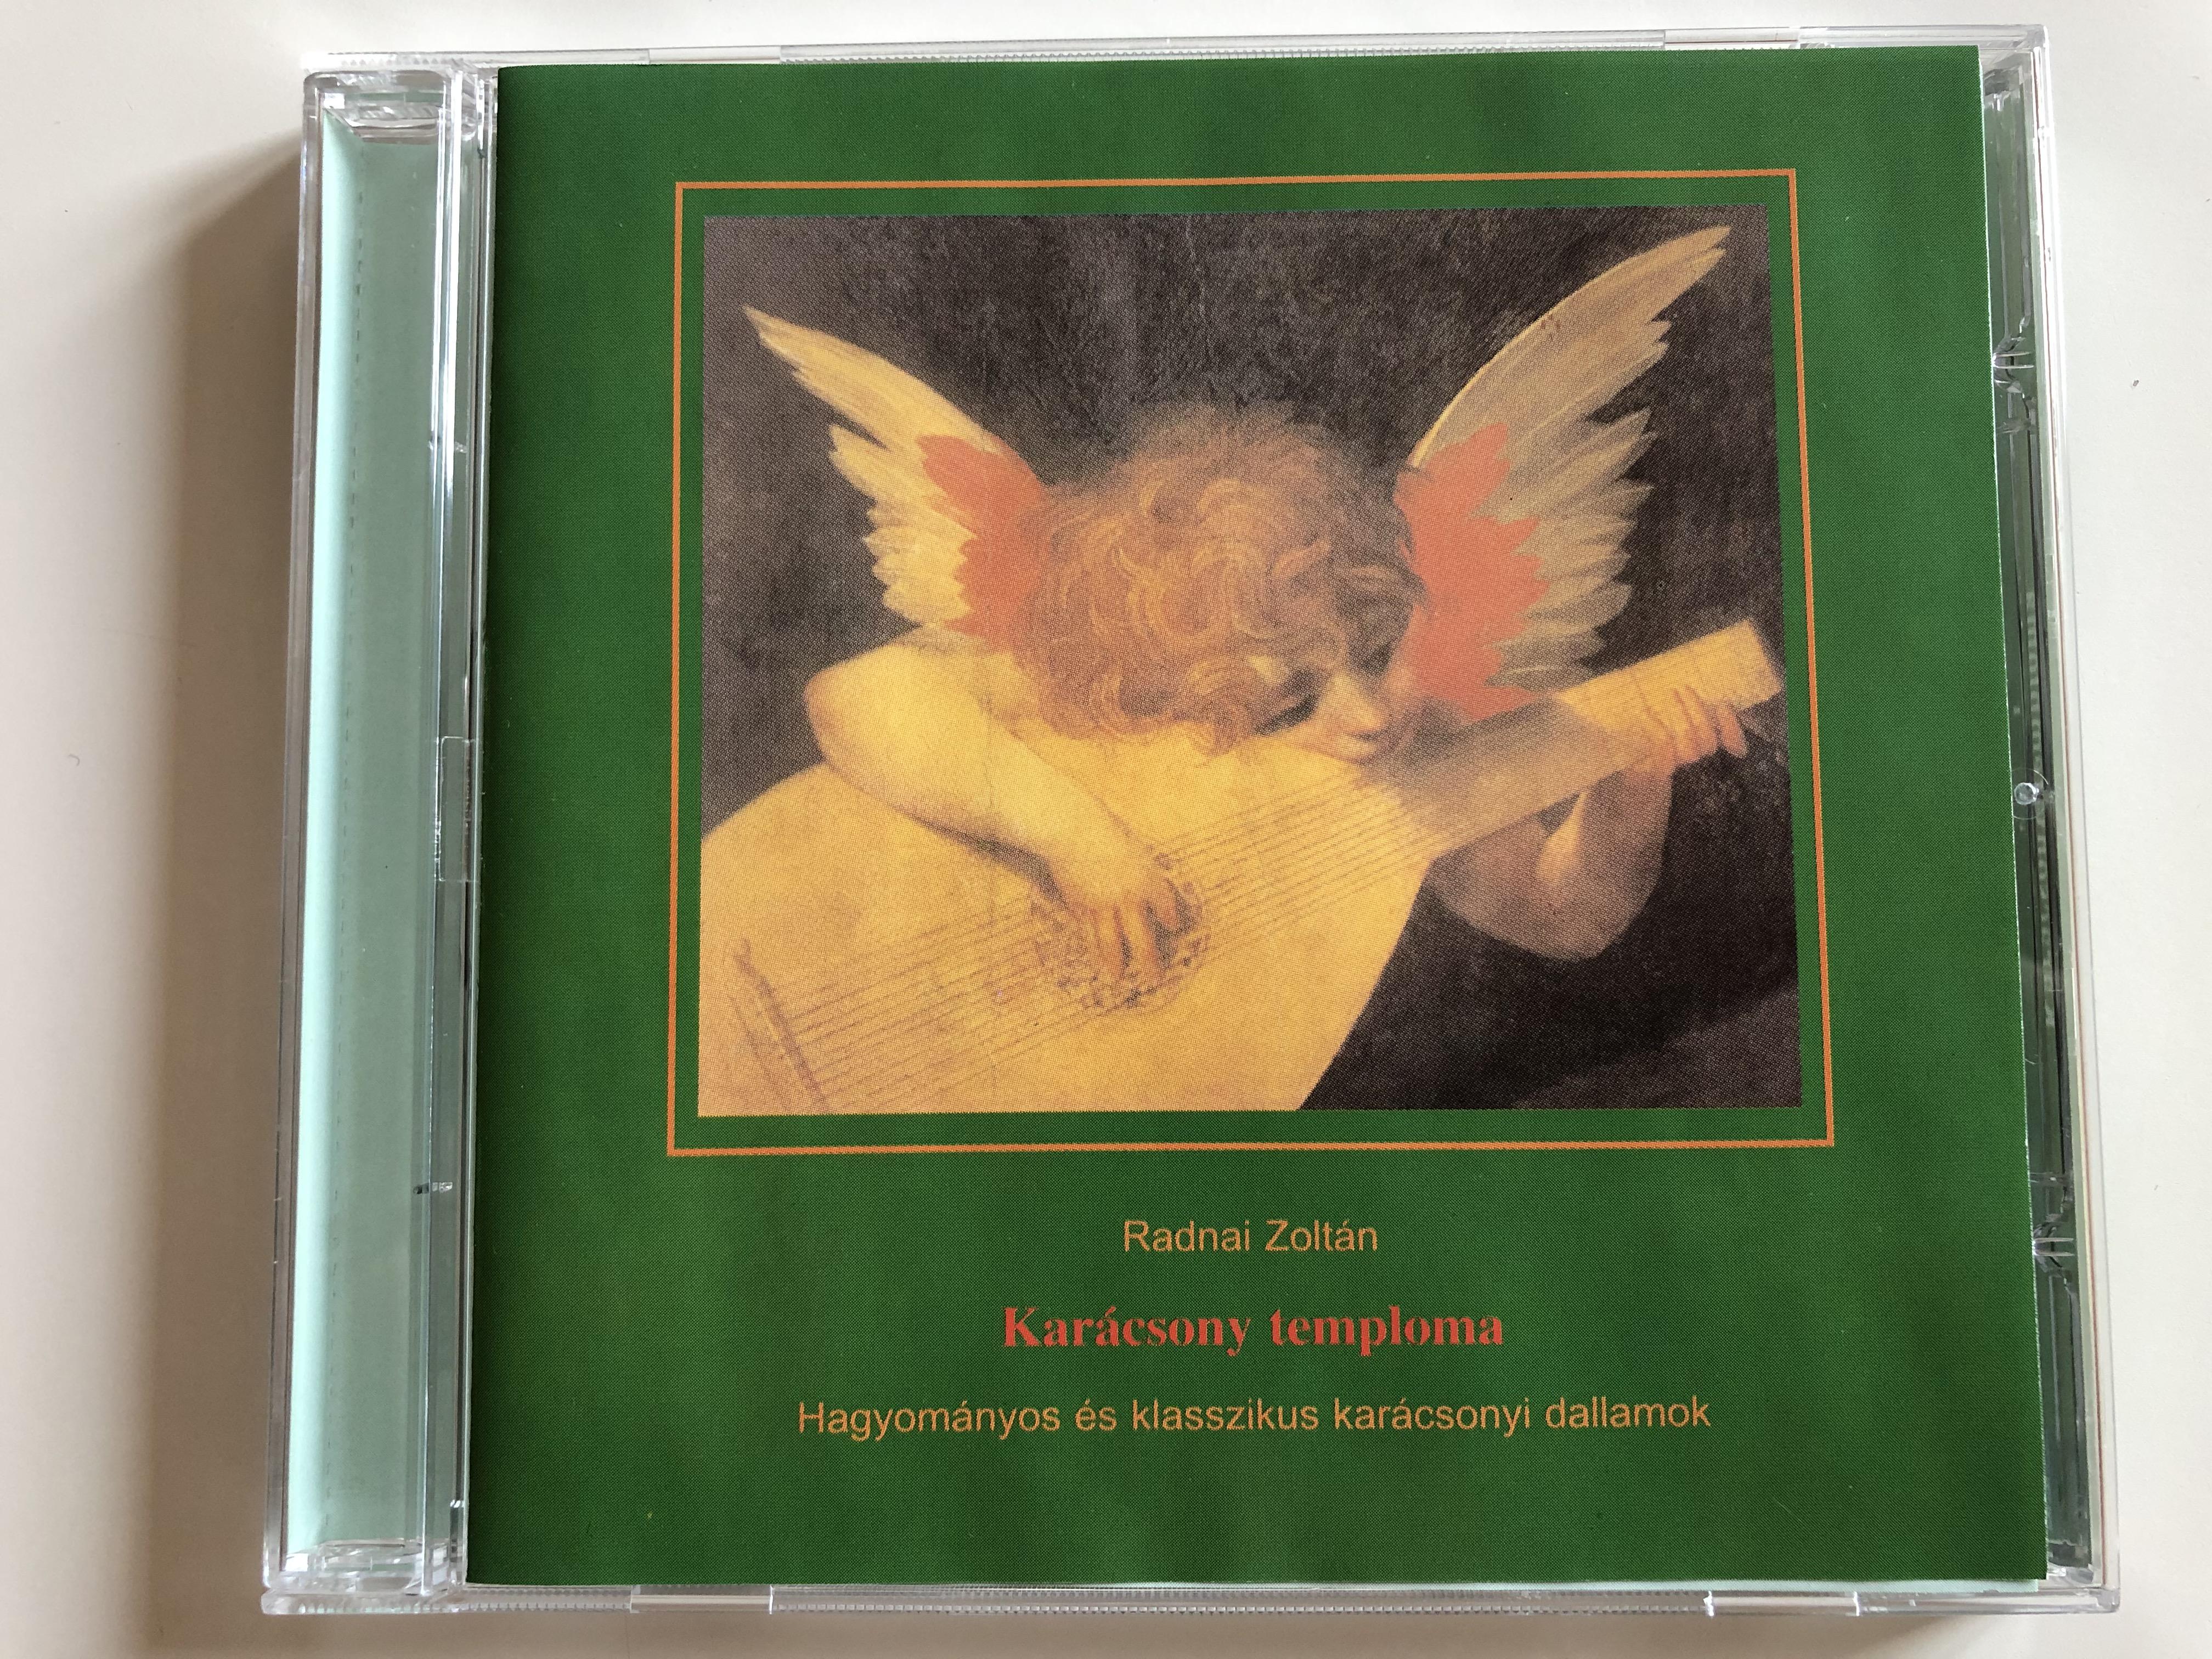 radnai-zolt-n-kar-csony-temploma-hagyom-nyos-s-klasszikus-kar-csonyi-dallamok-tom-tom-records-audio-cd-2002-ttcd-32-1-.jpg